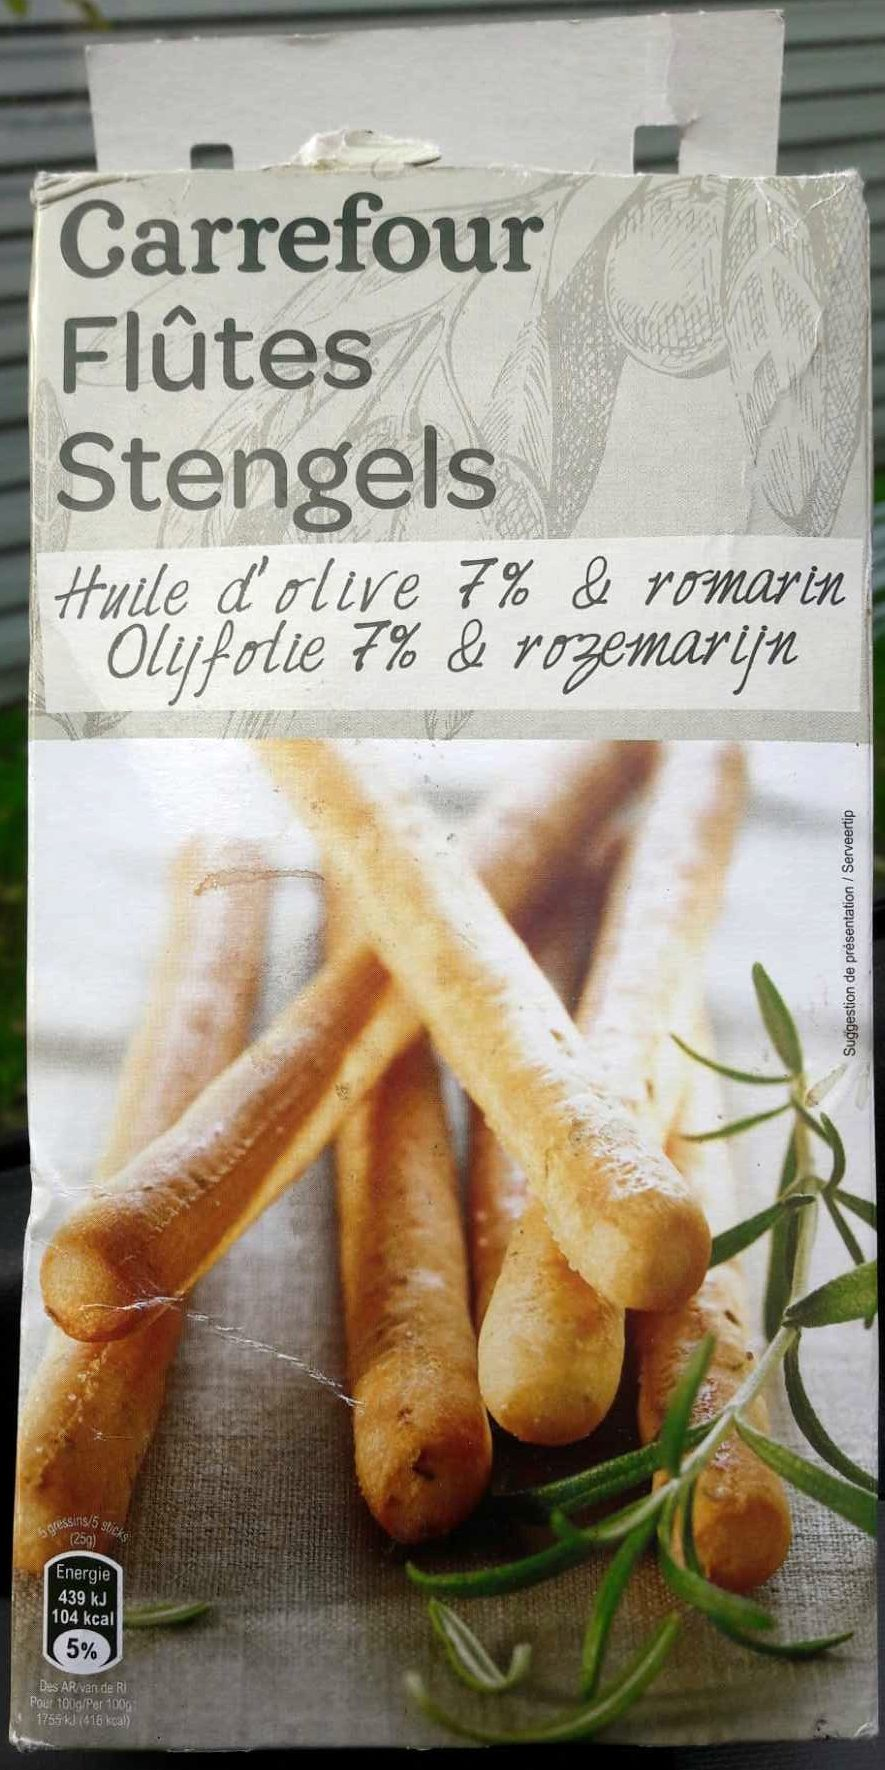 Flûtes Huile d'olive 7% & romarin - Product - fr